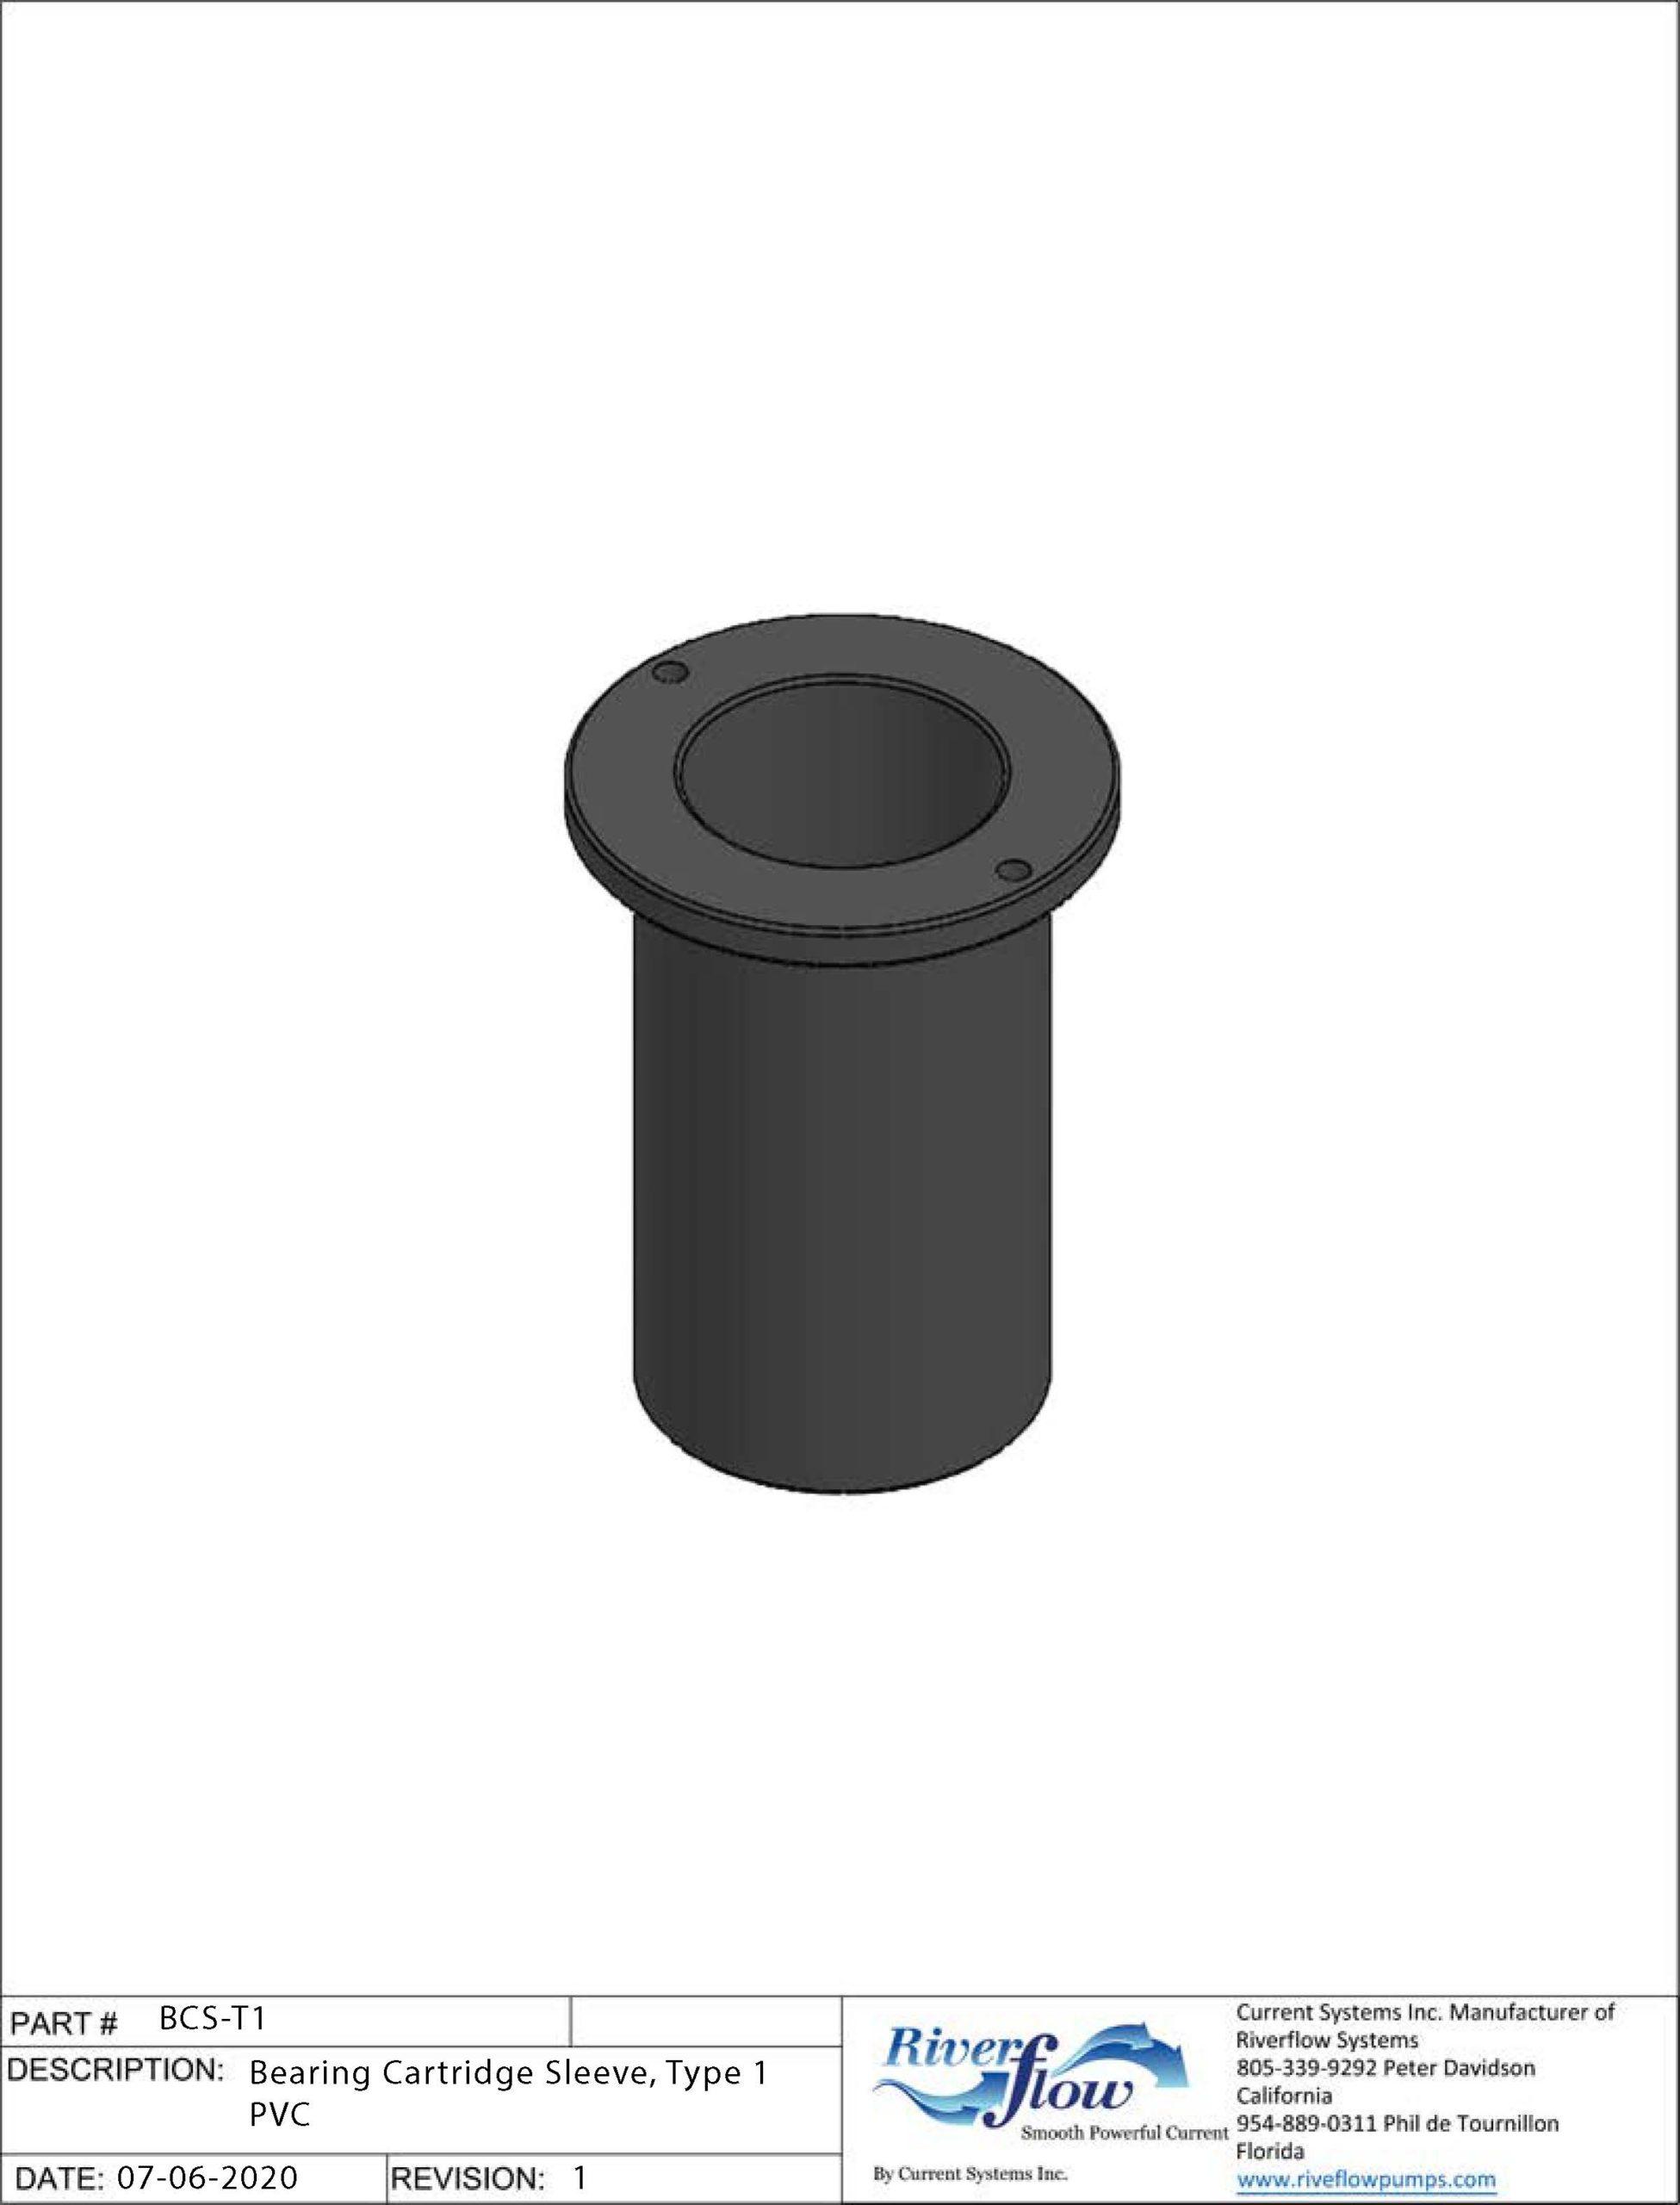 BCS-T1 Bearing Cartridge Sleeve, Type 1 PVC